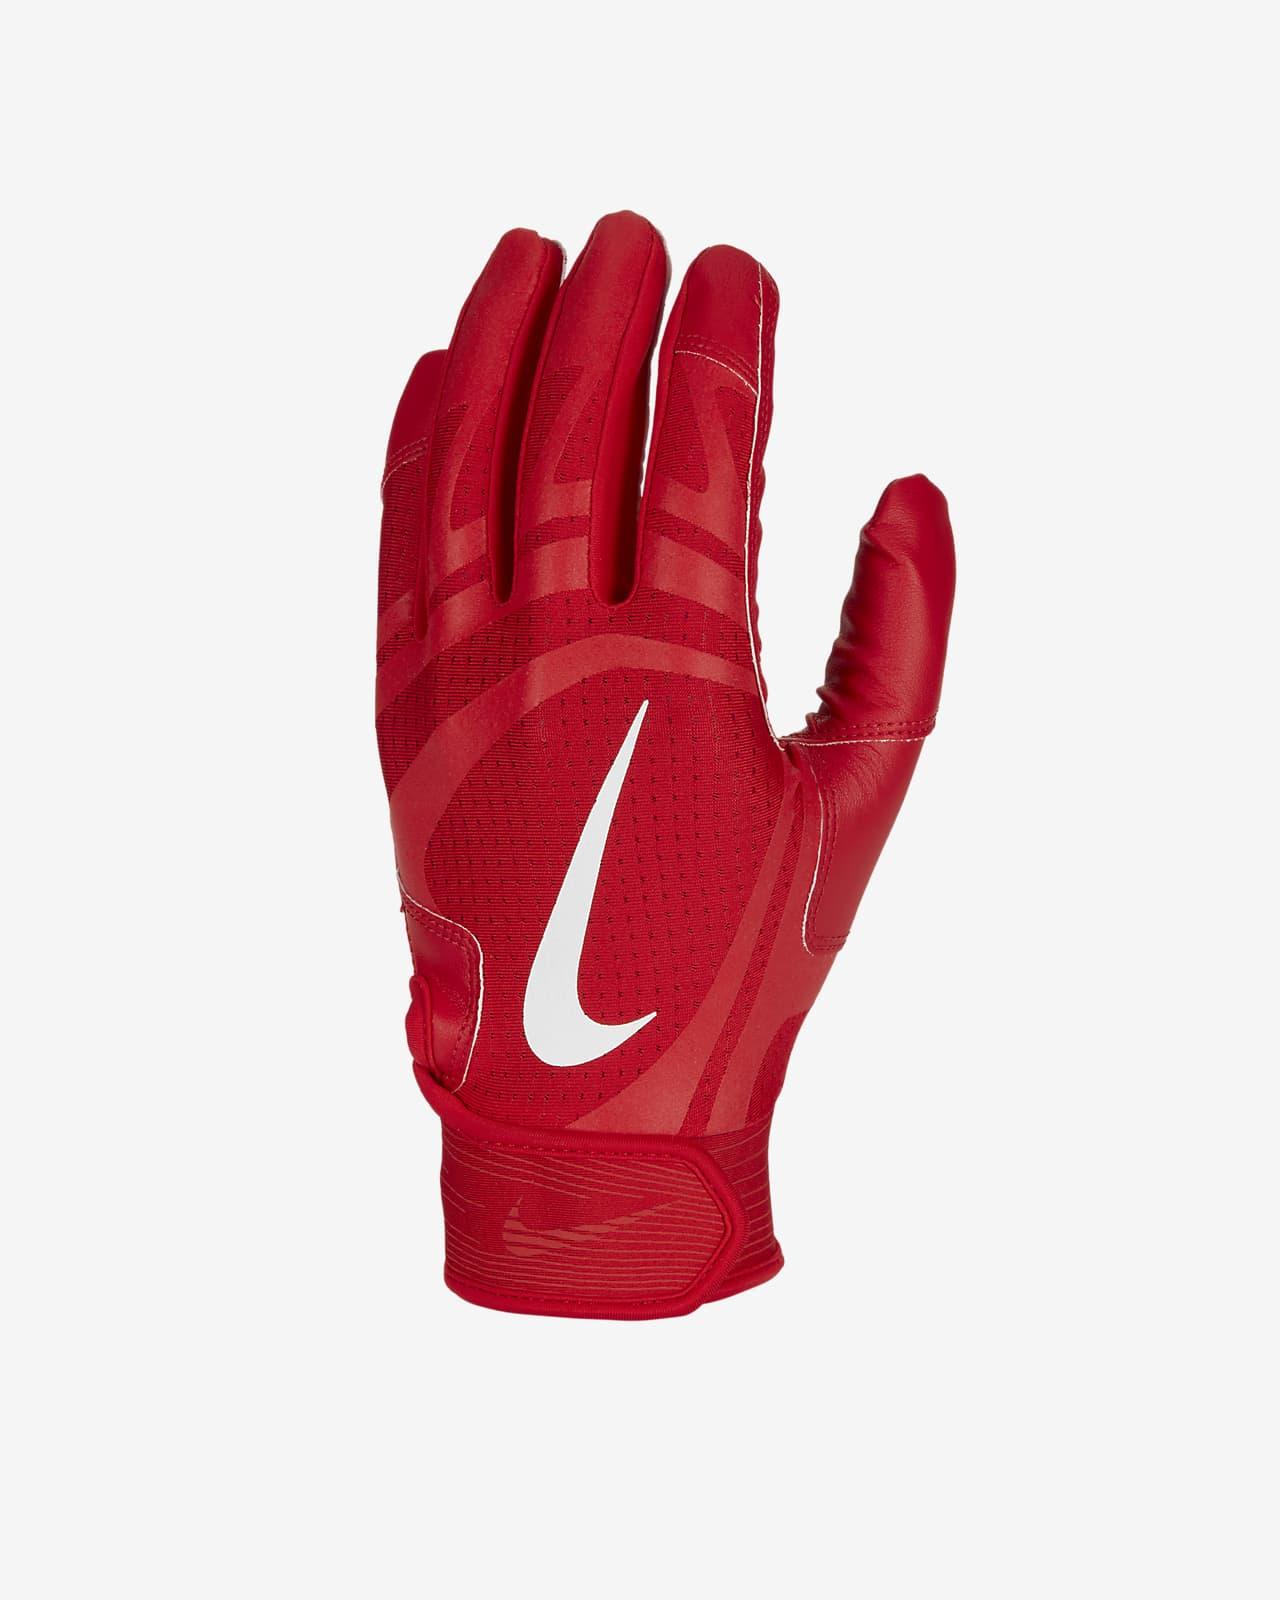 Guantes de bateo para béisbol Nike Alpha Huarache Edge